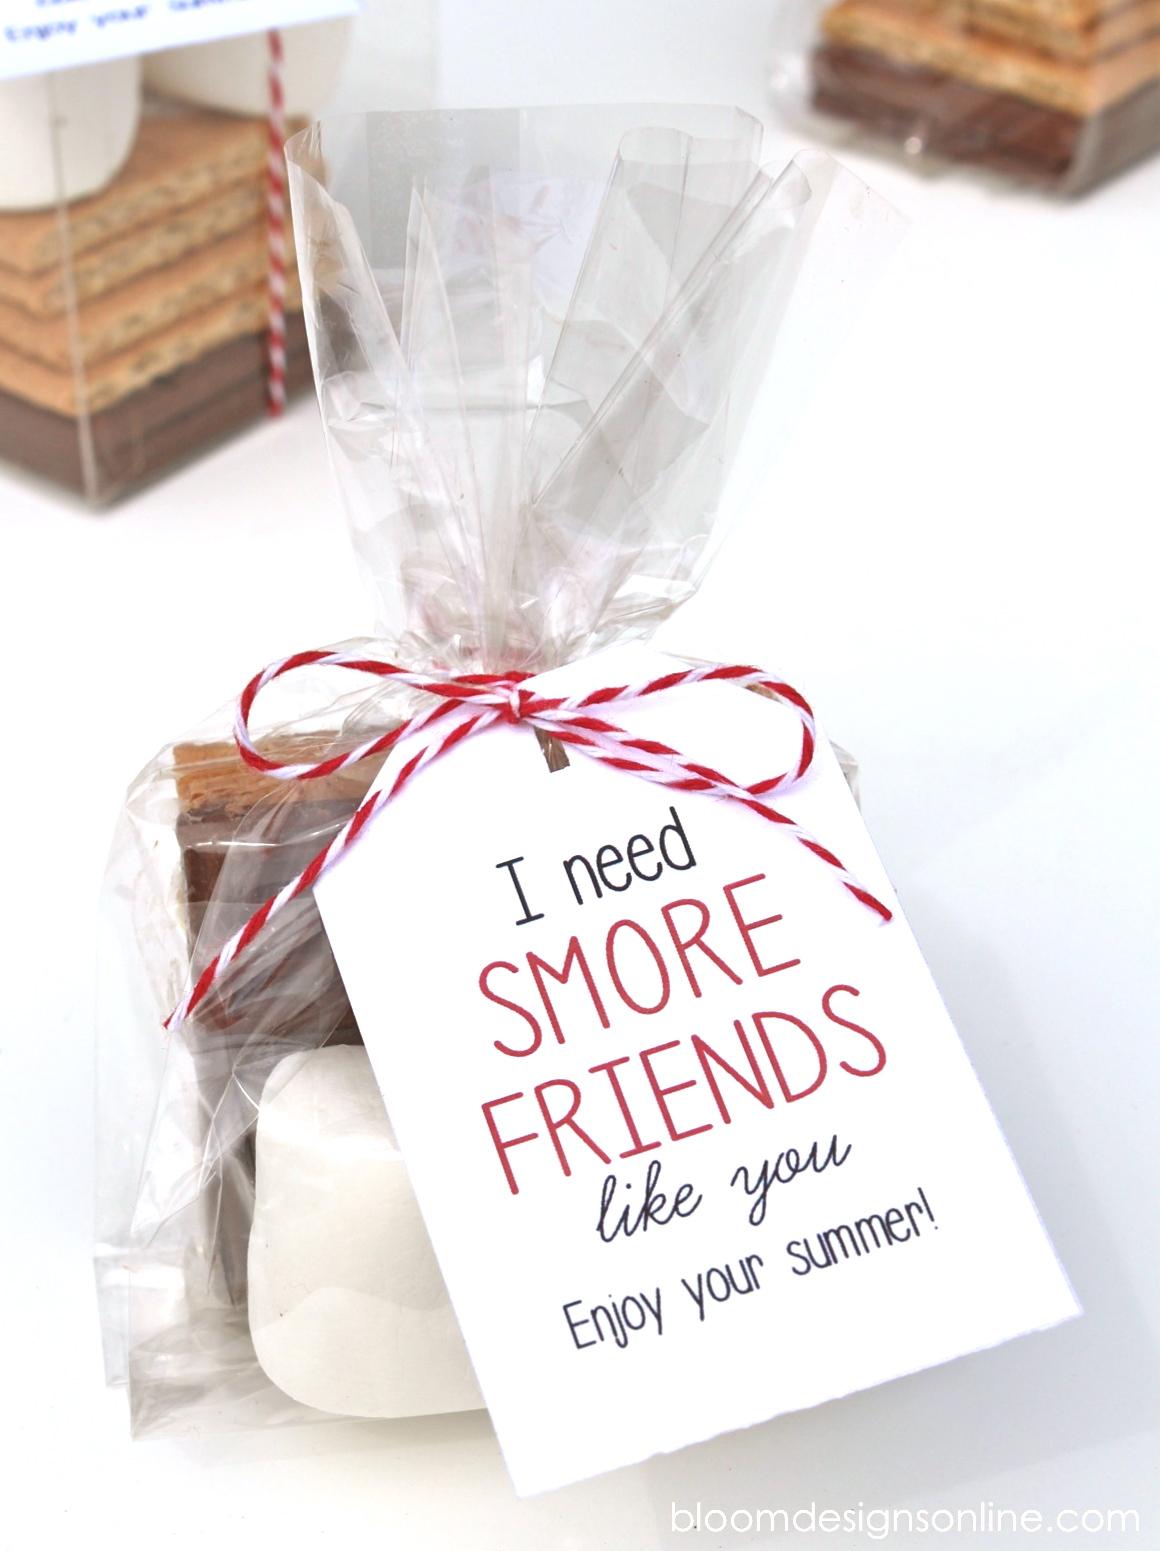 Cute Gift Ideas for Friends